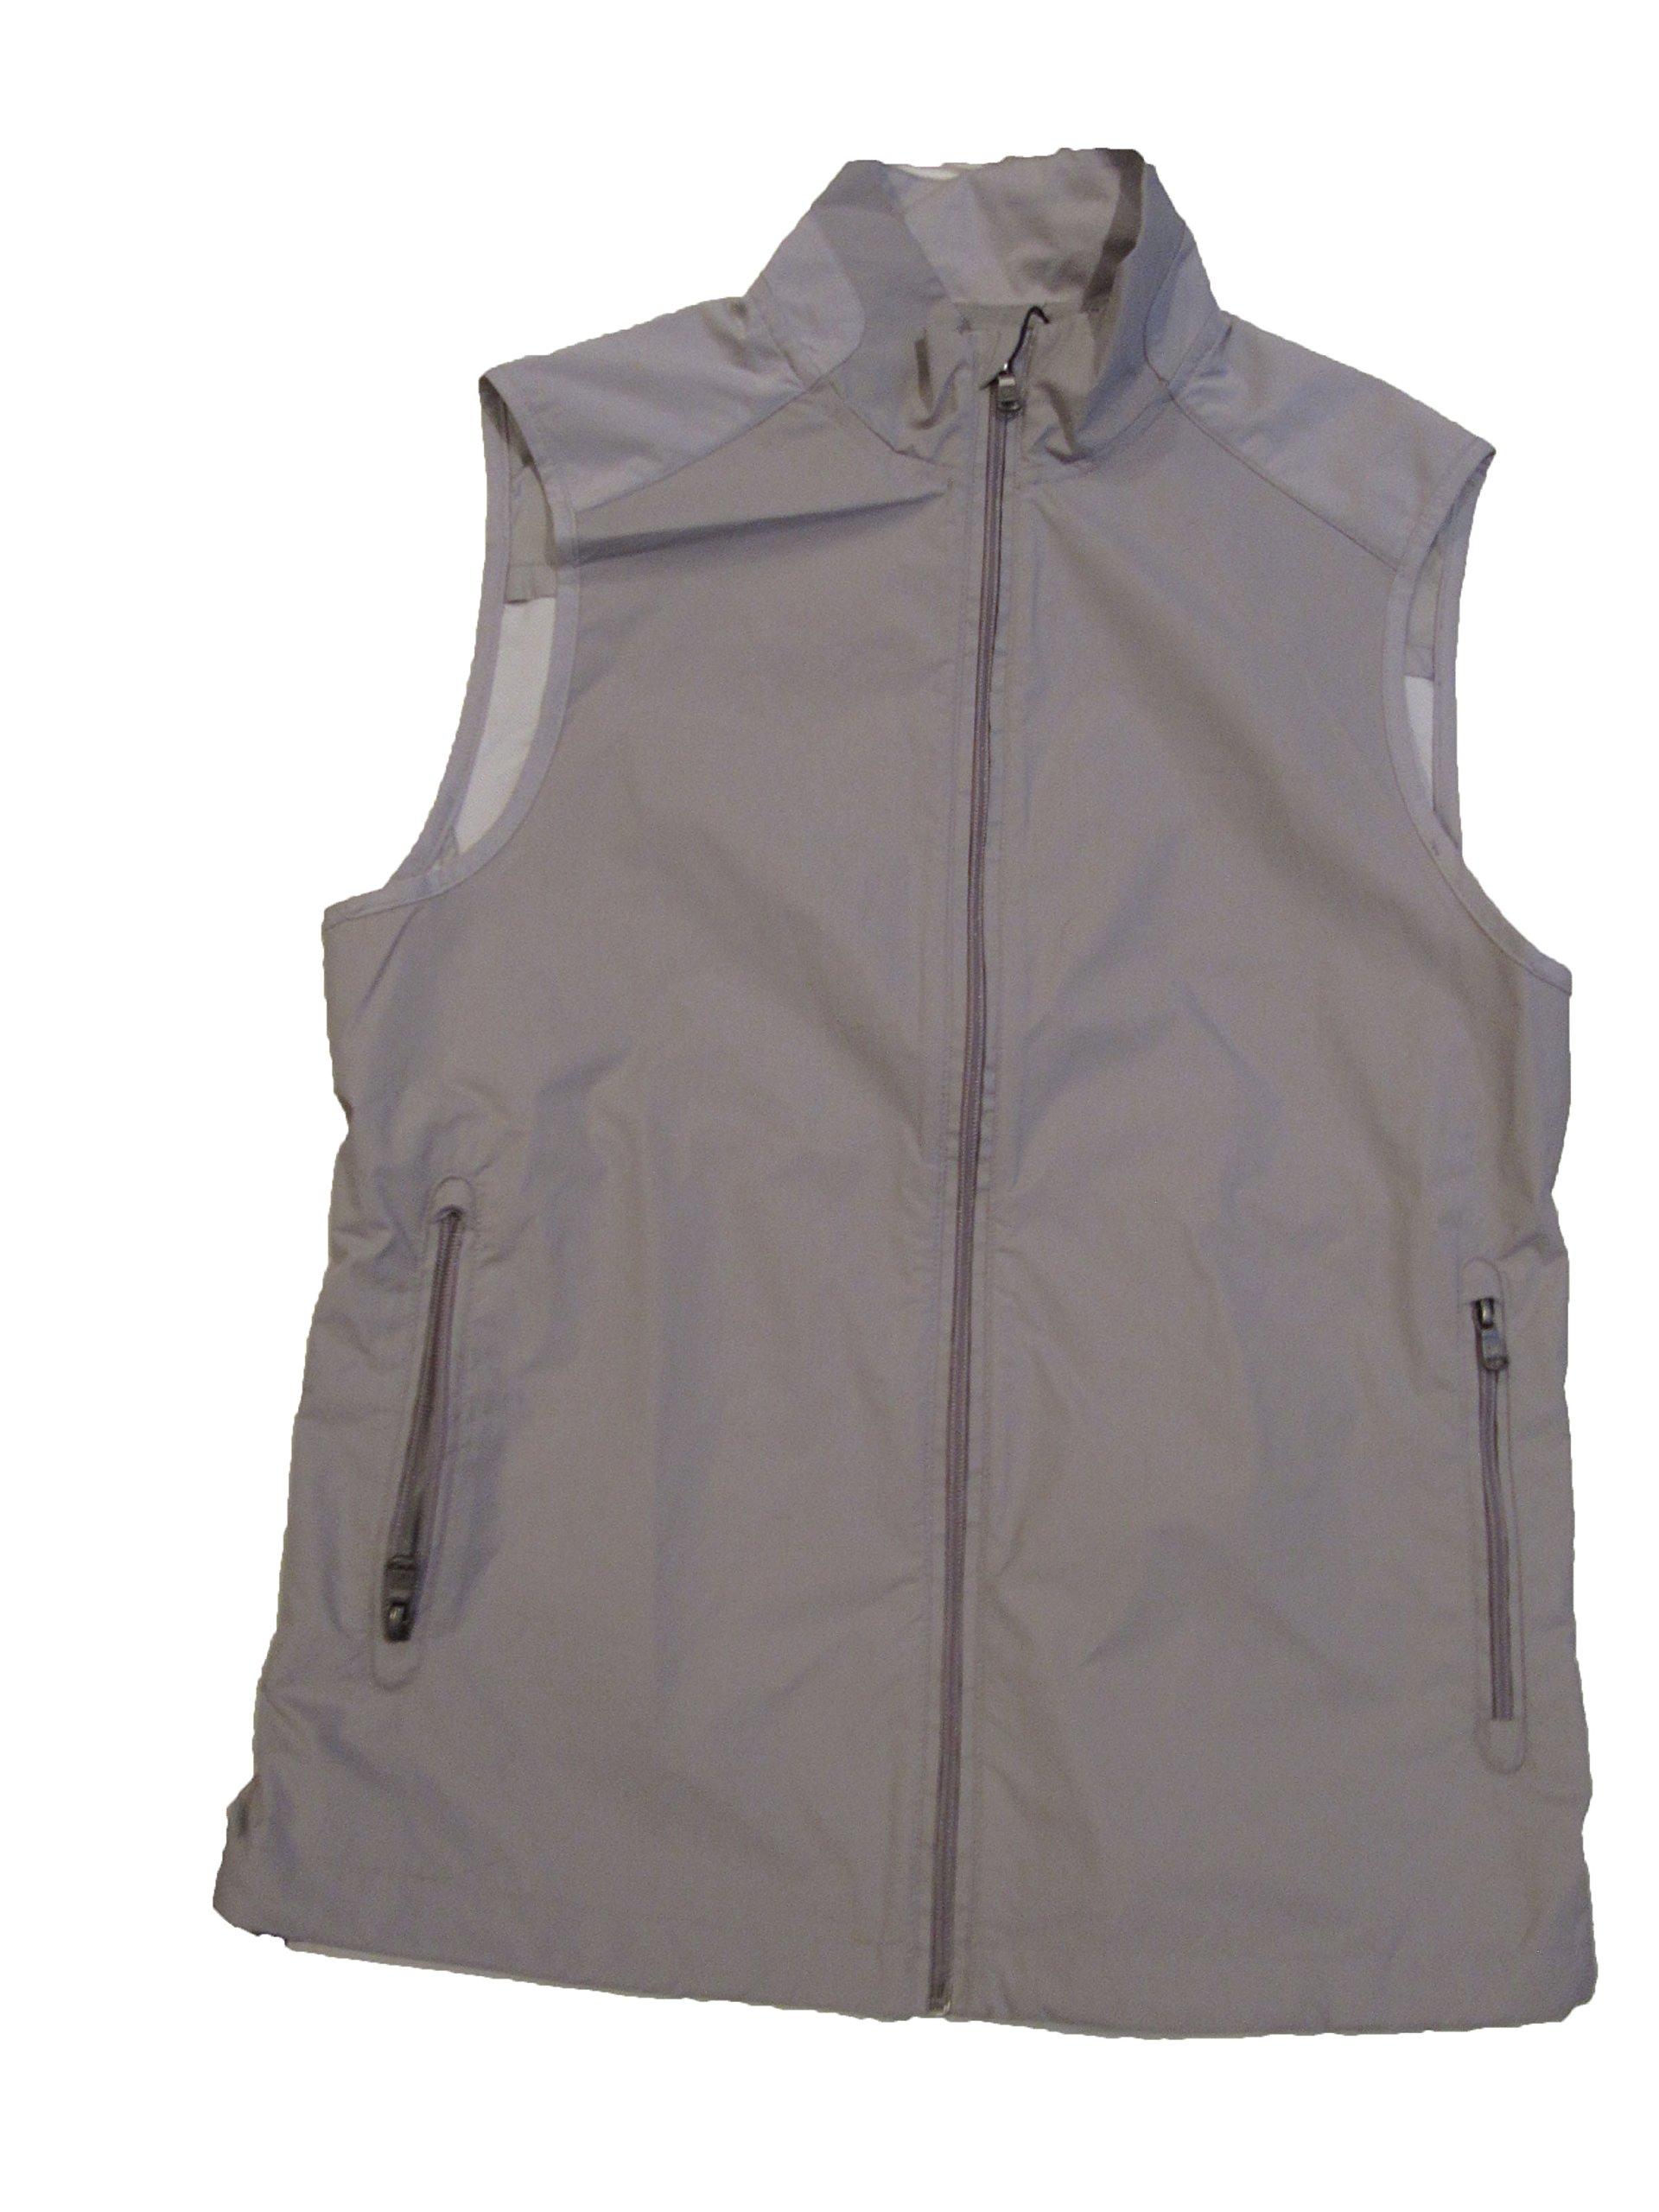 Polo Ralph Lauren Golf Vest Jacket Mens Size Small Grey